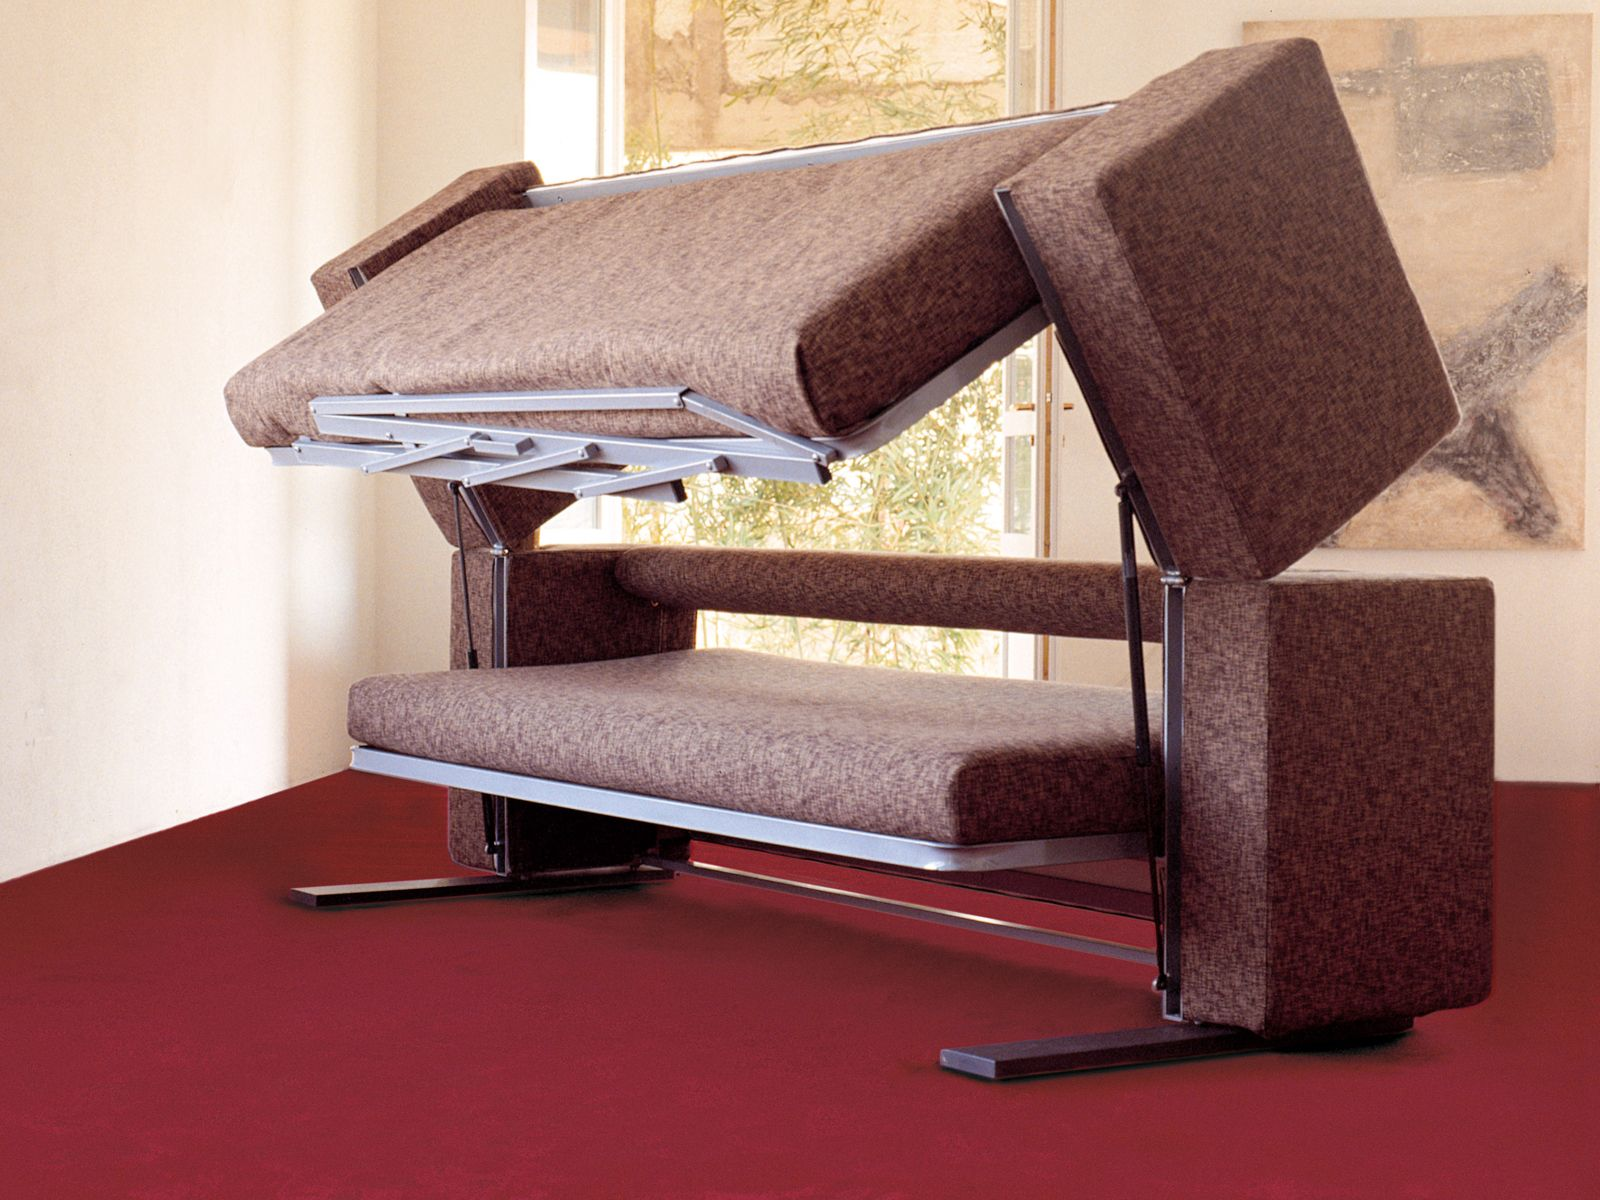 sofa bunk beds by architect giulio manzoni 5 - Doc Sofa Etagenbett Ikea